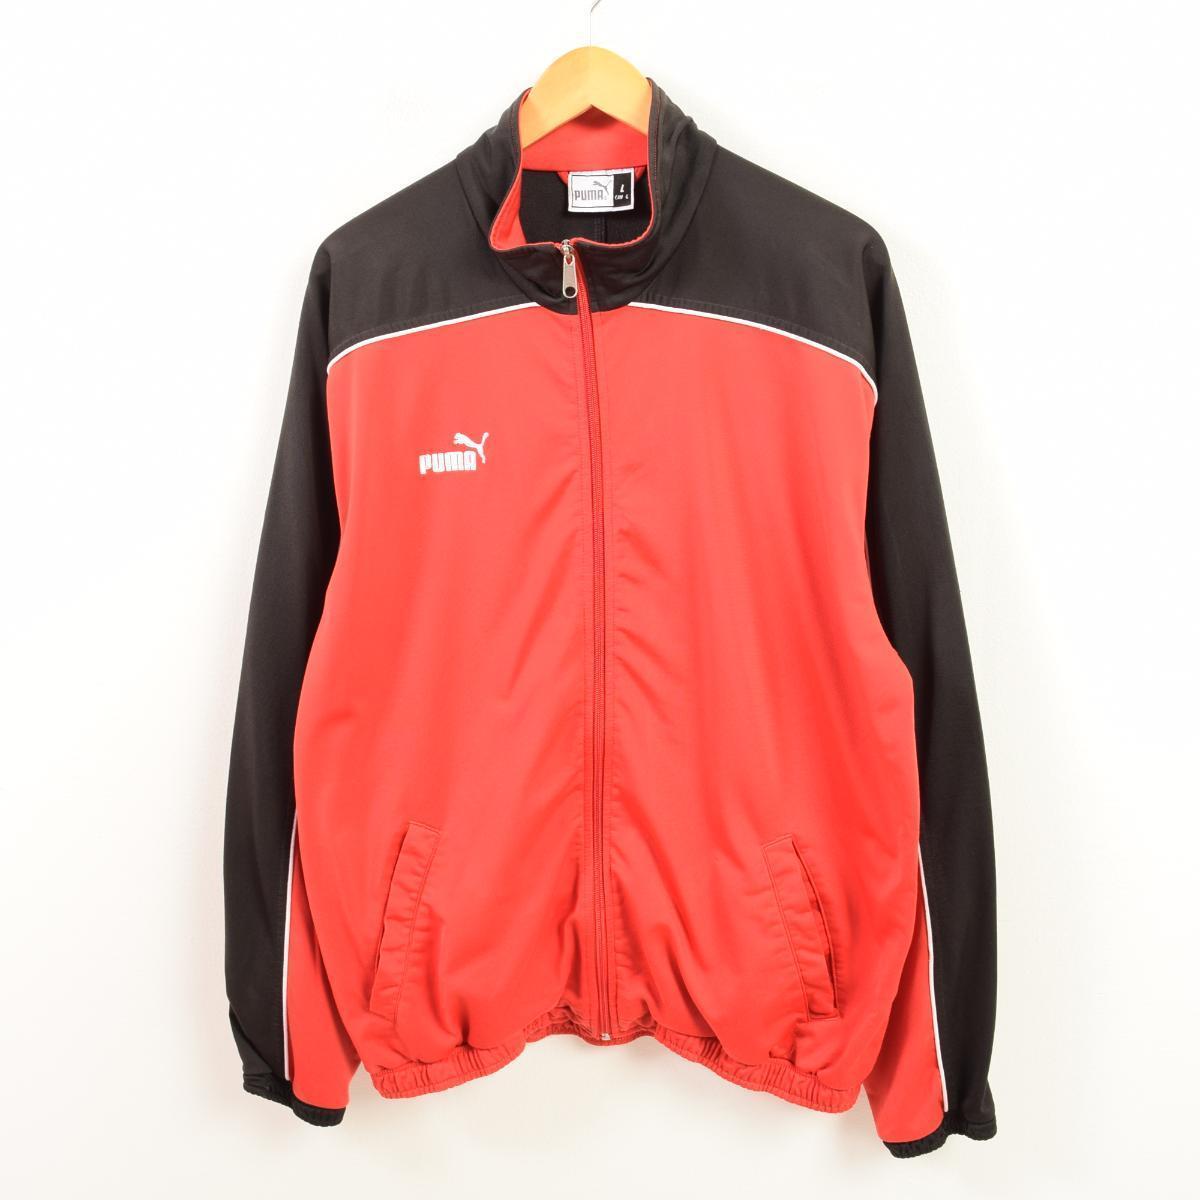 4542ca6663b8 VINTAGE CLOTHING JAM  Puma PUMA jersey truck jacket men XL  wat1283 ...